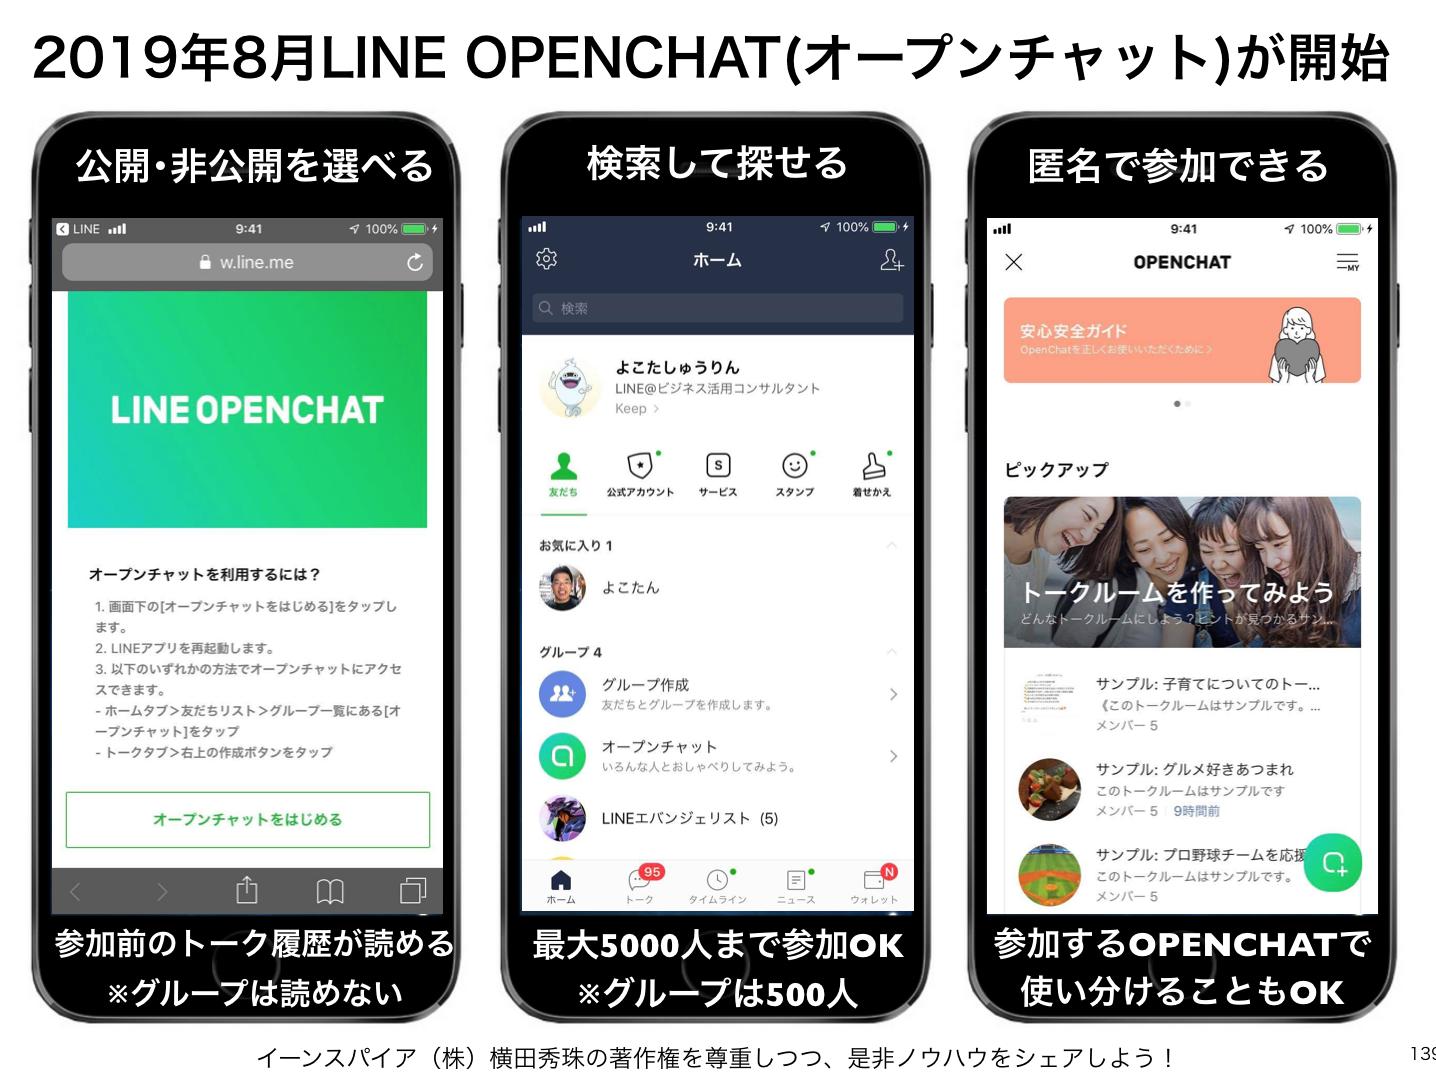 LINE OPENCHAT 開始・作成・参加・検索・招待・利用する方法